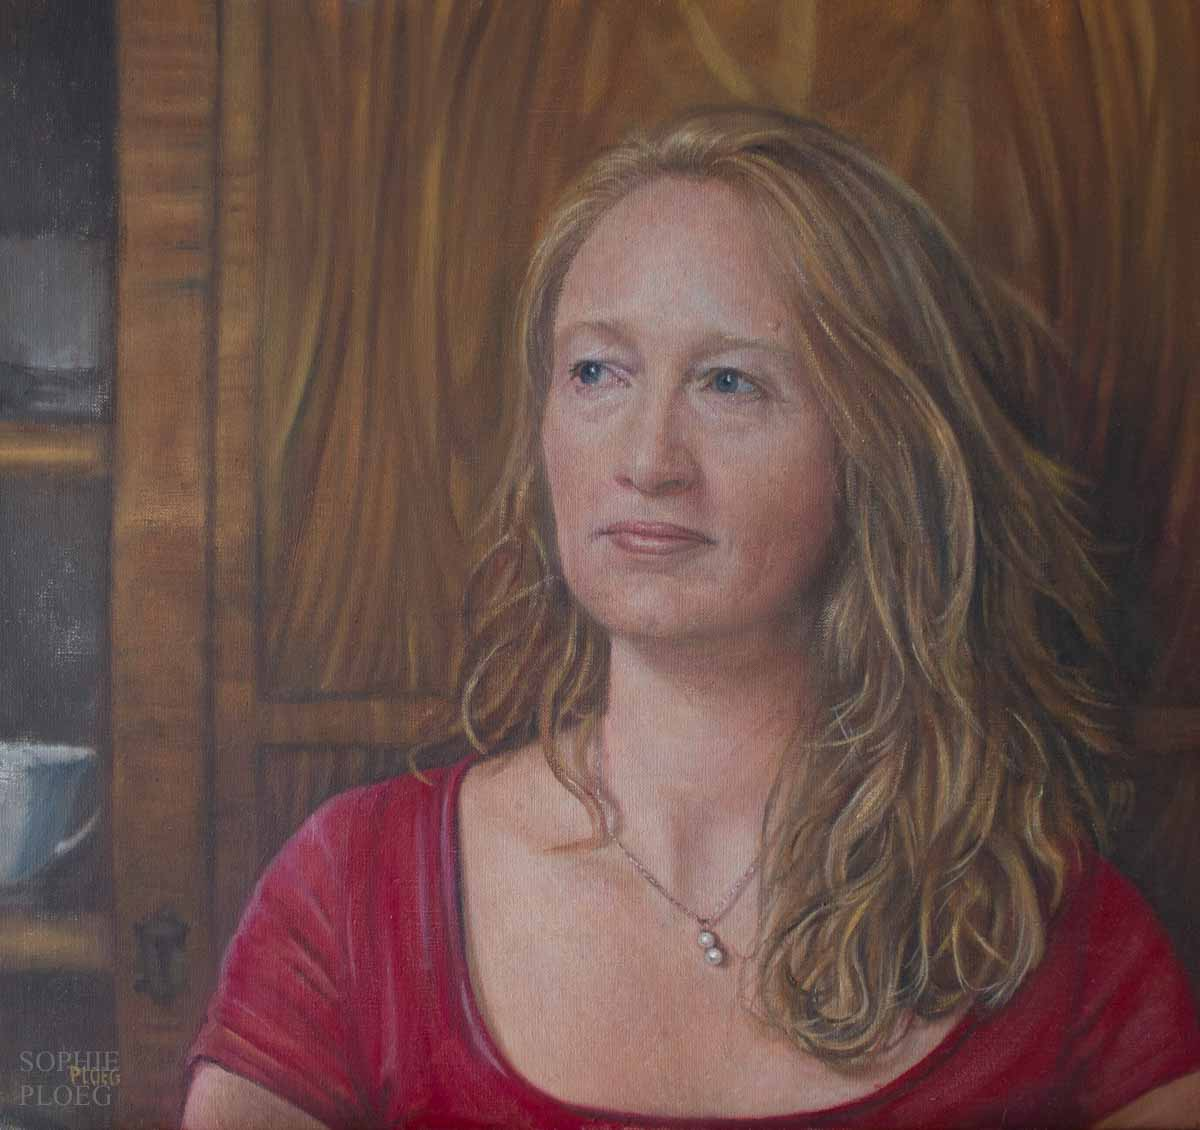 Sophie Ploeg, Nicola, oil on linen, 35x38cm. Commissioned.